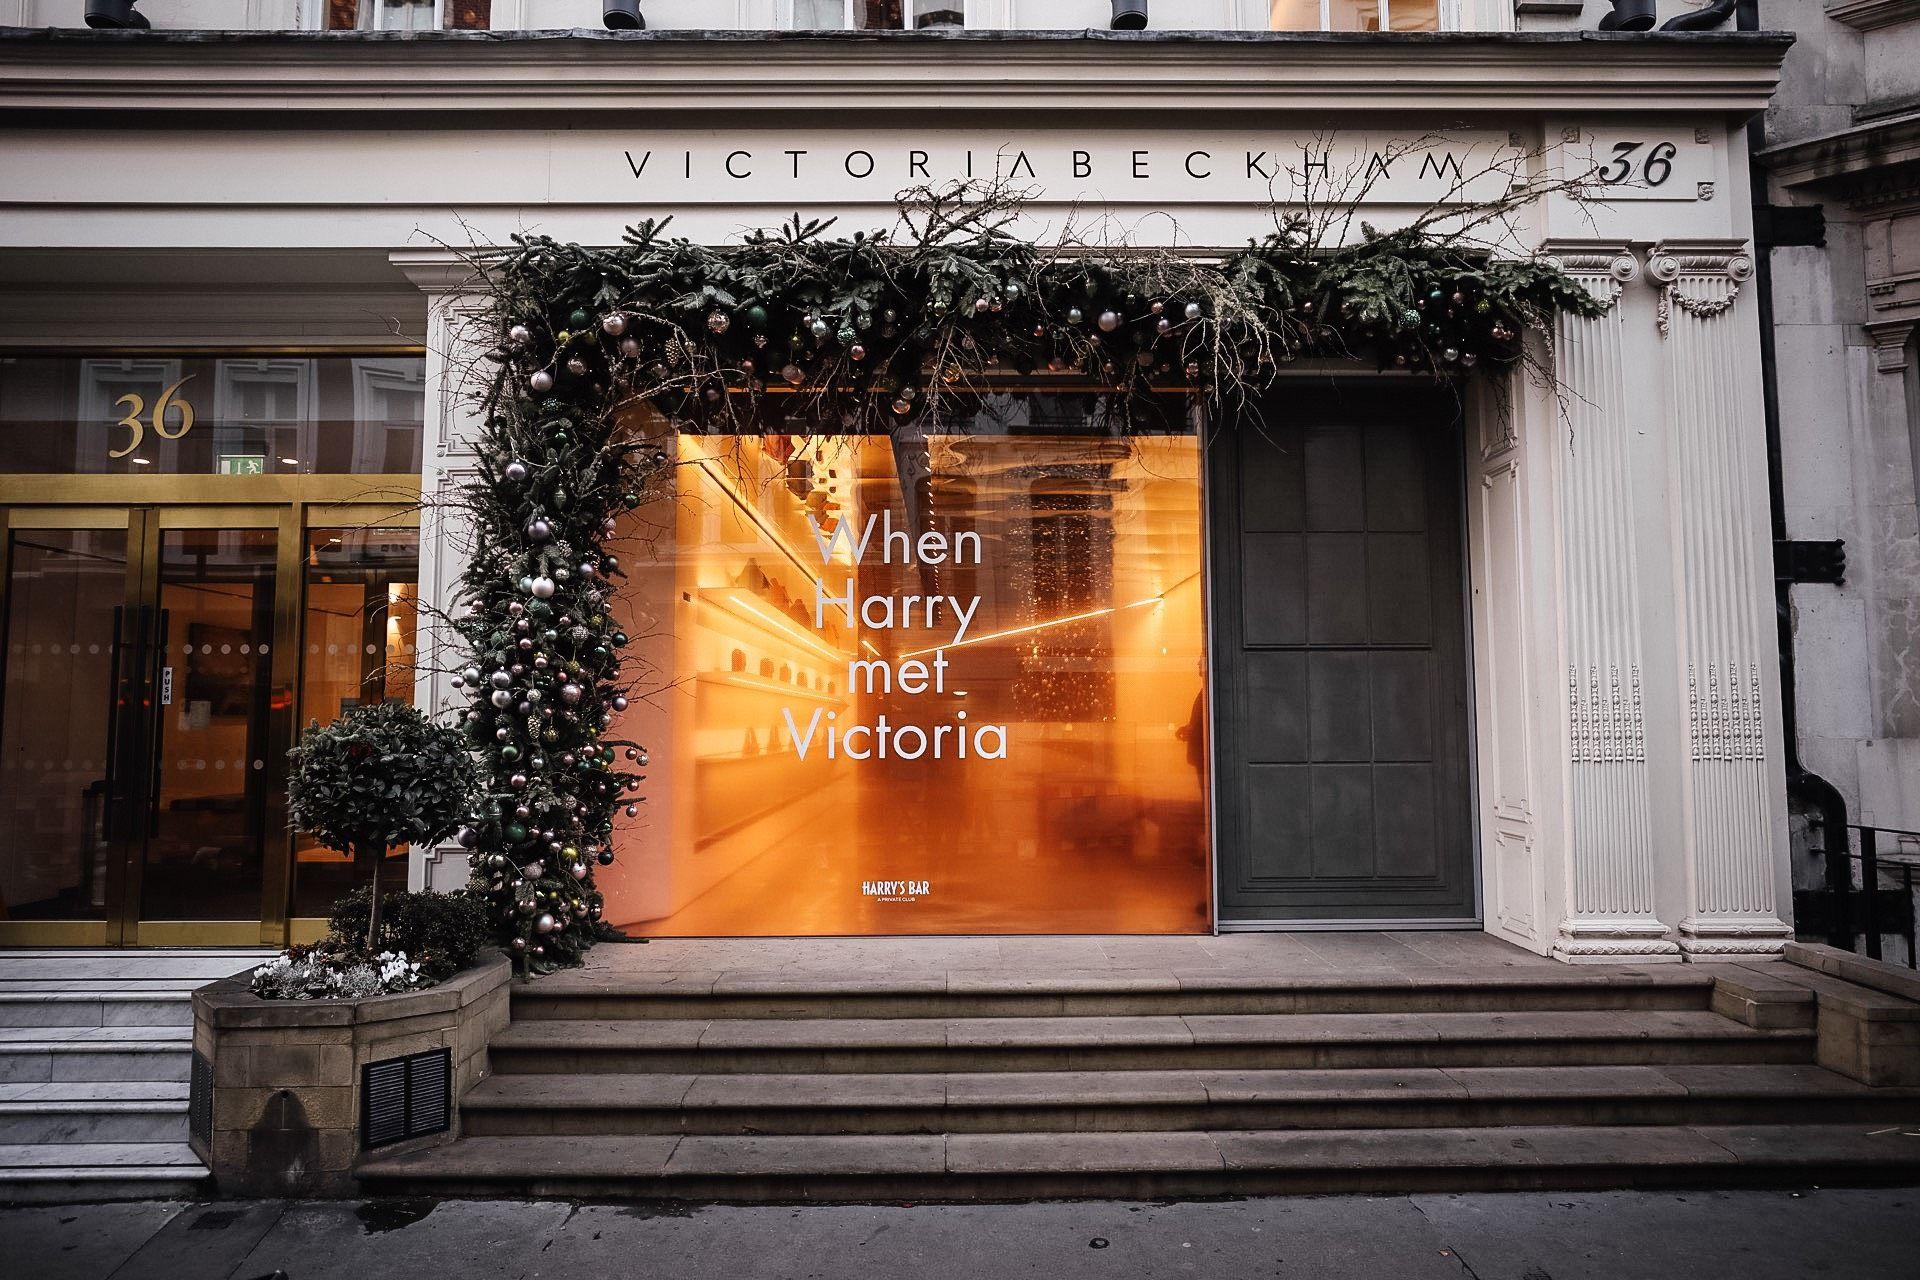 Victoria Beckham Christmas window display